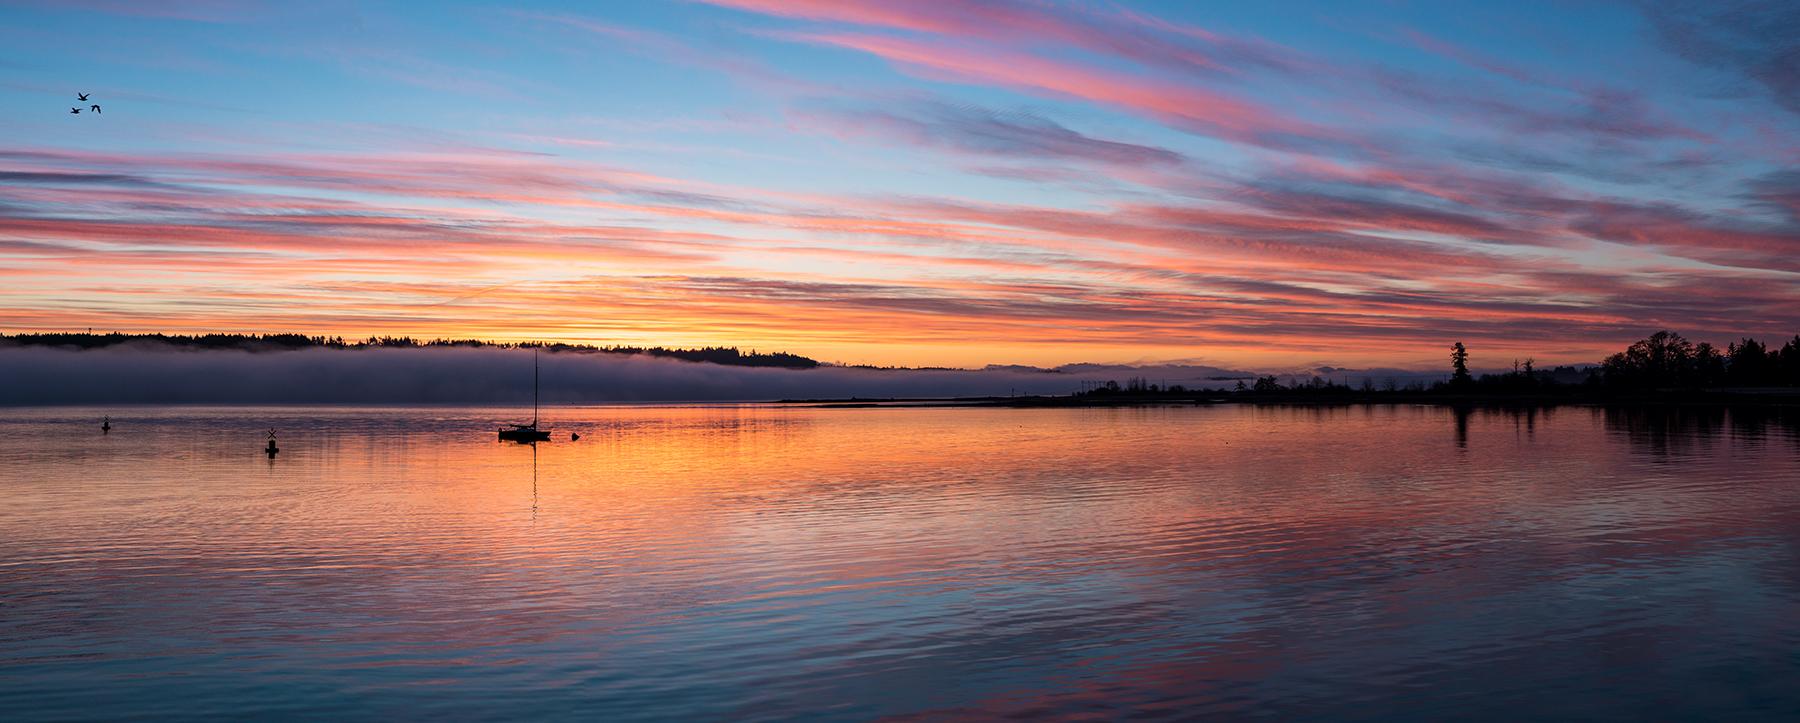 Sunrise at Buckley Bay Ferry Terminal